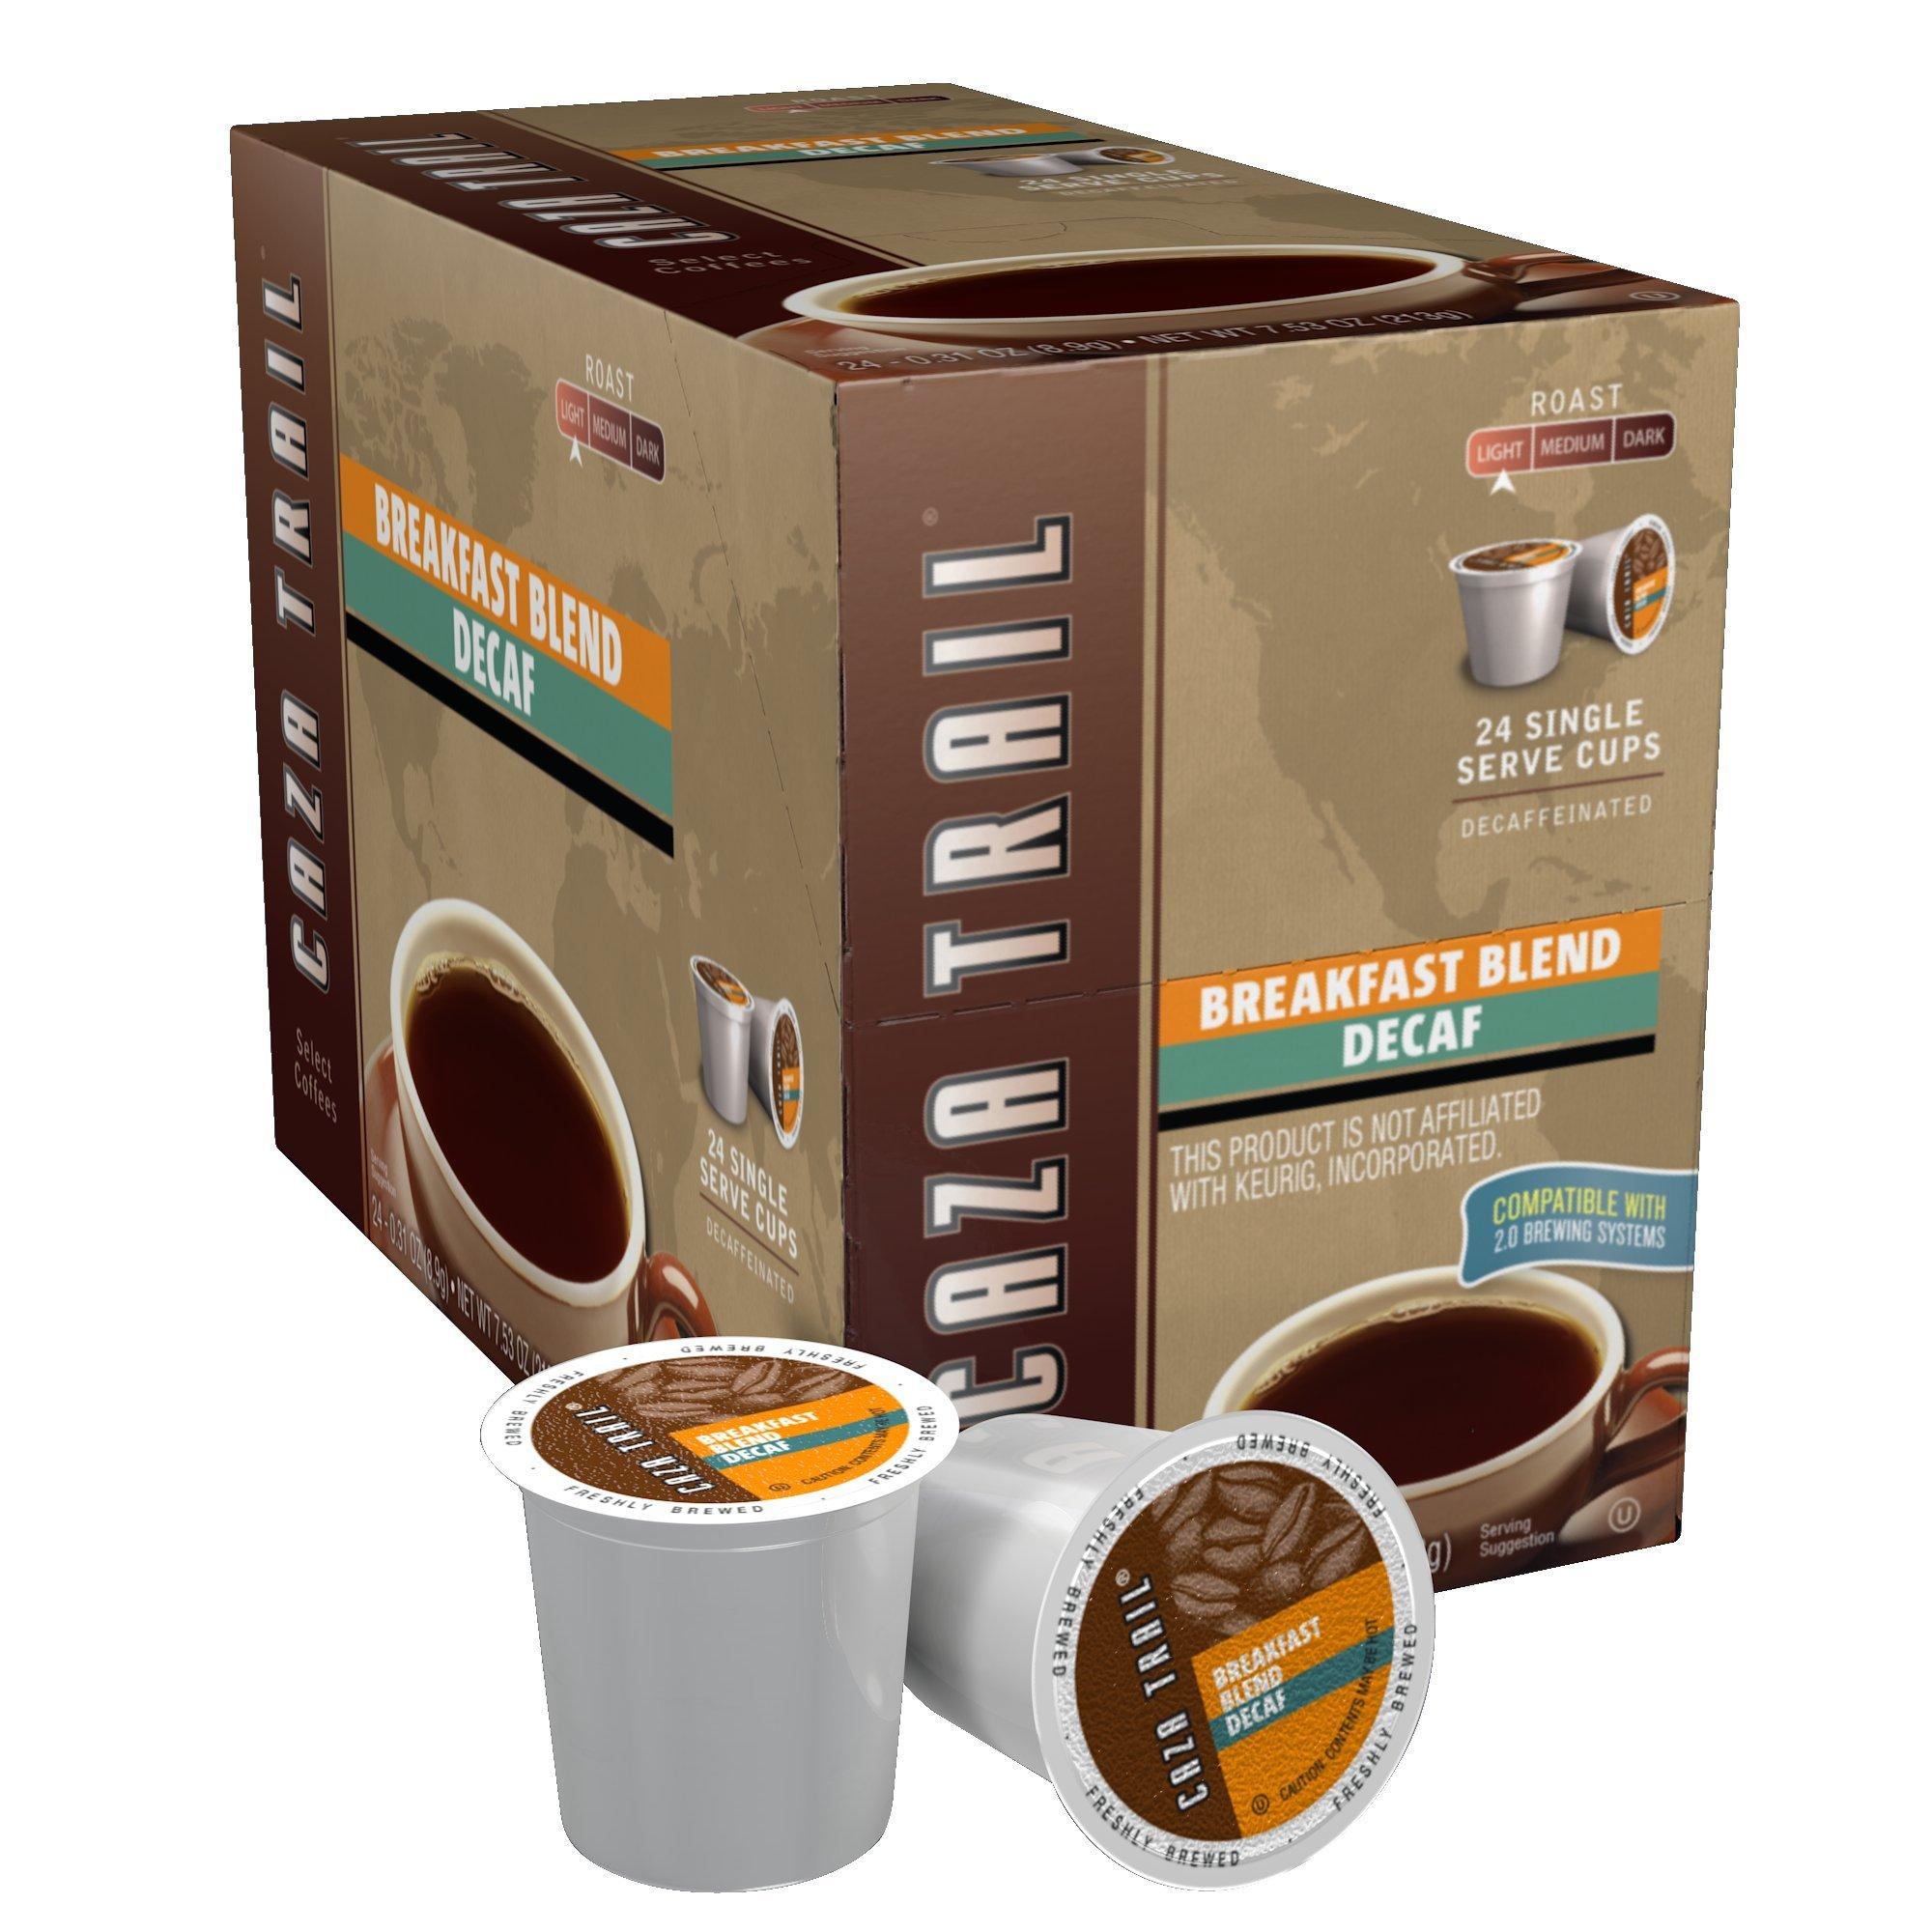 Caza Trail Coffee, Decaf Breakfast Blend, 24 Single Serve Cups